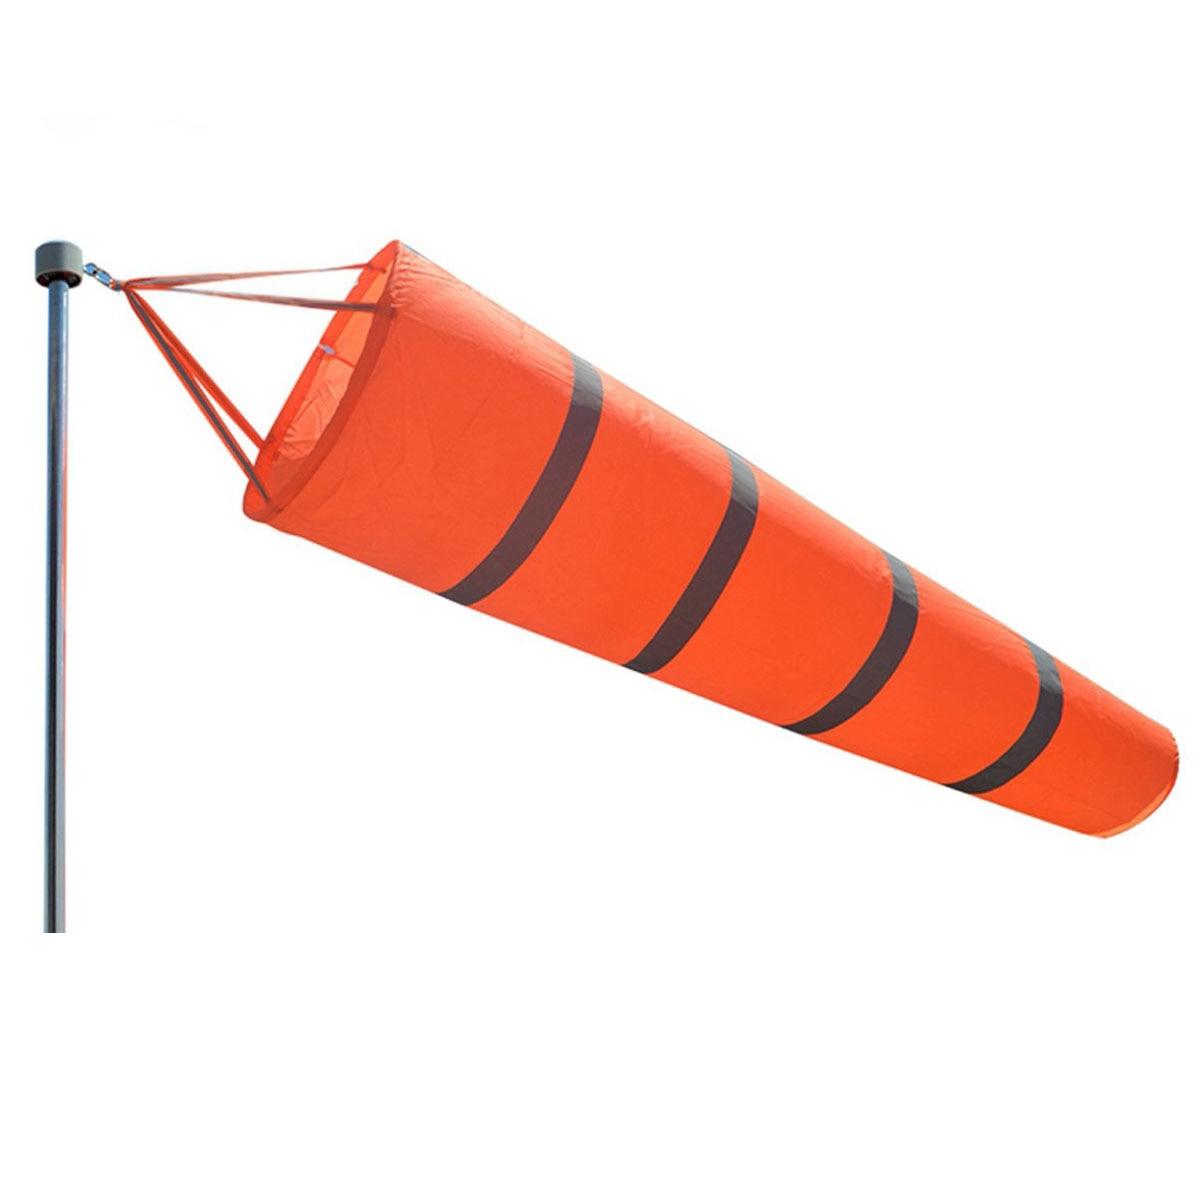 LBLA Outdoor Aviation Windsock Rip-stop Wind Measurement Sock Bag Reflective Belt Wind Monitoring Toy for Meteorology 80cm